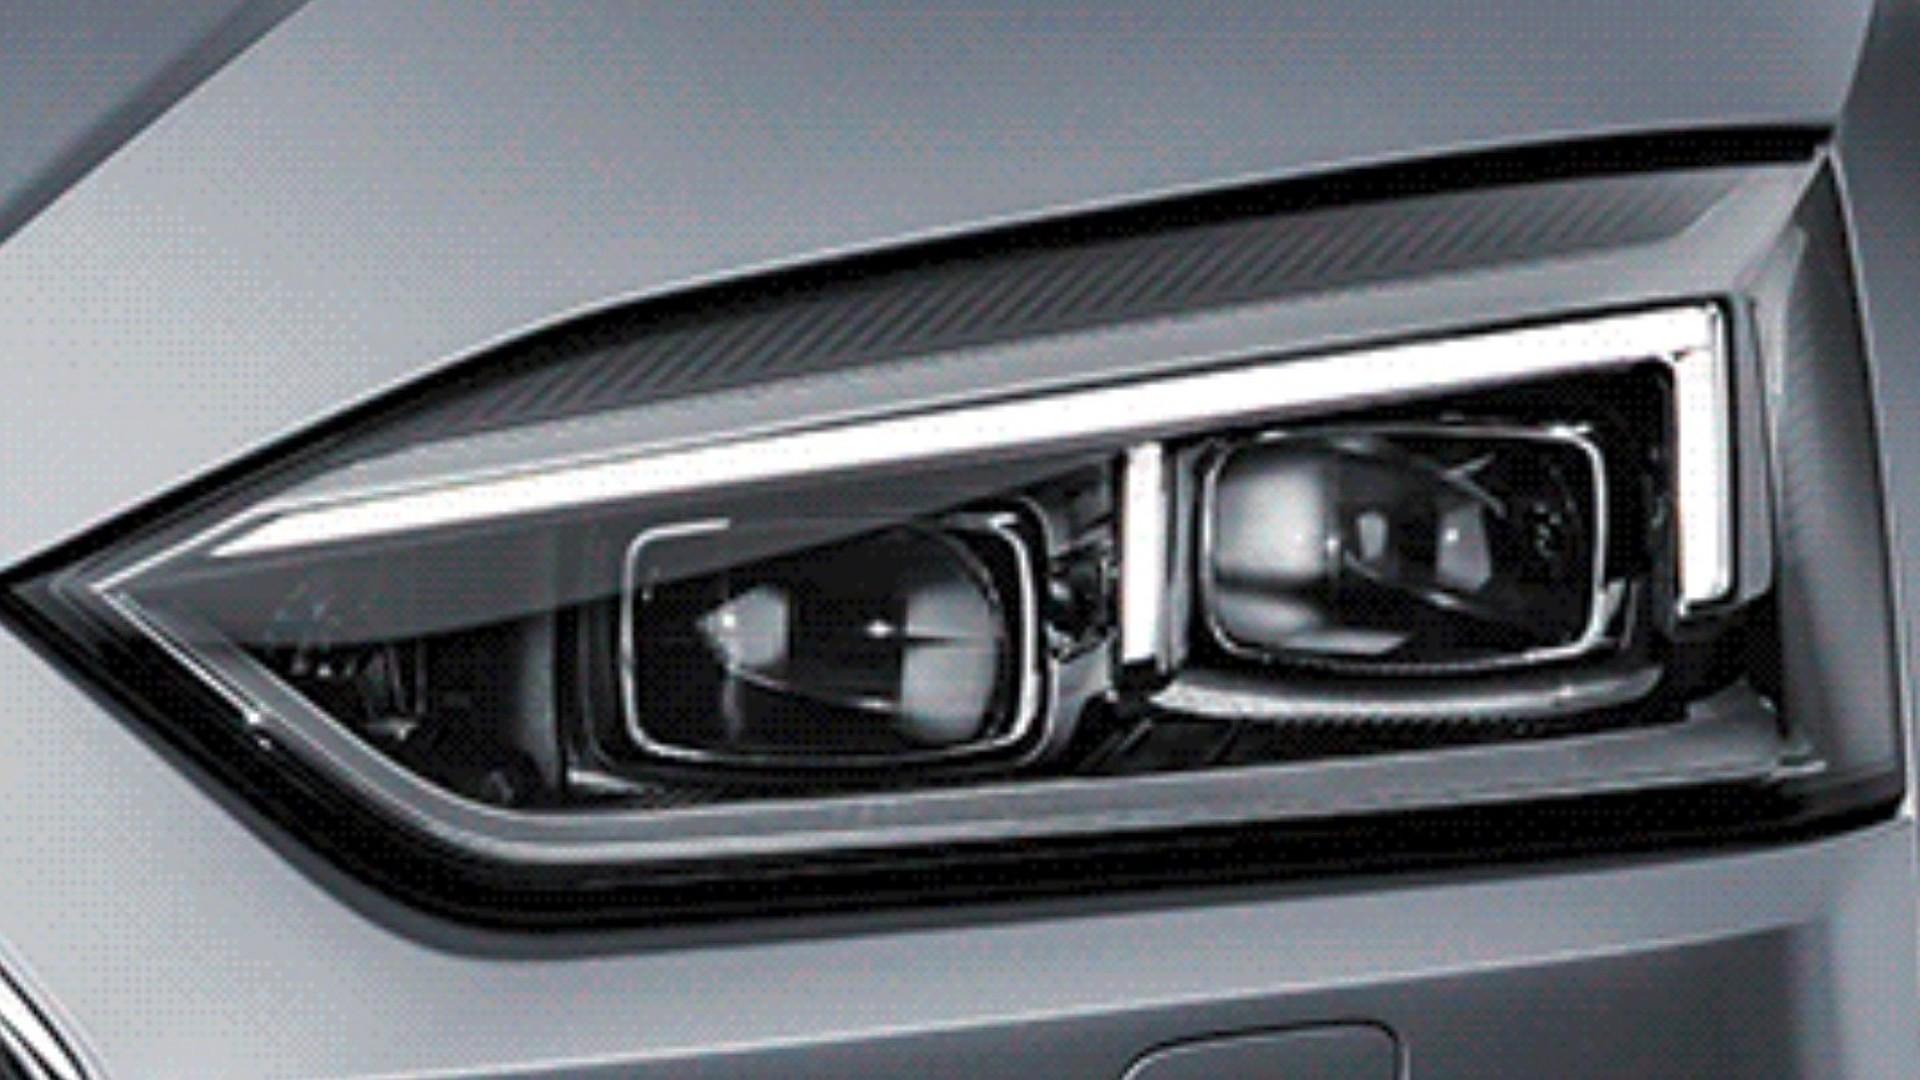 2017 Audi A5 Coupe headlights revealed